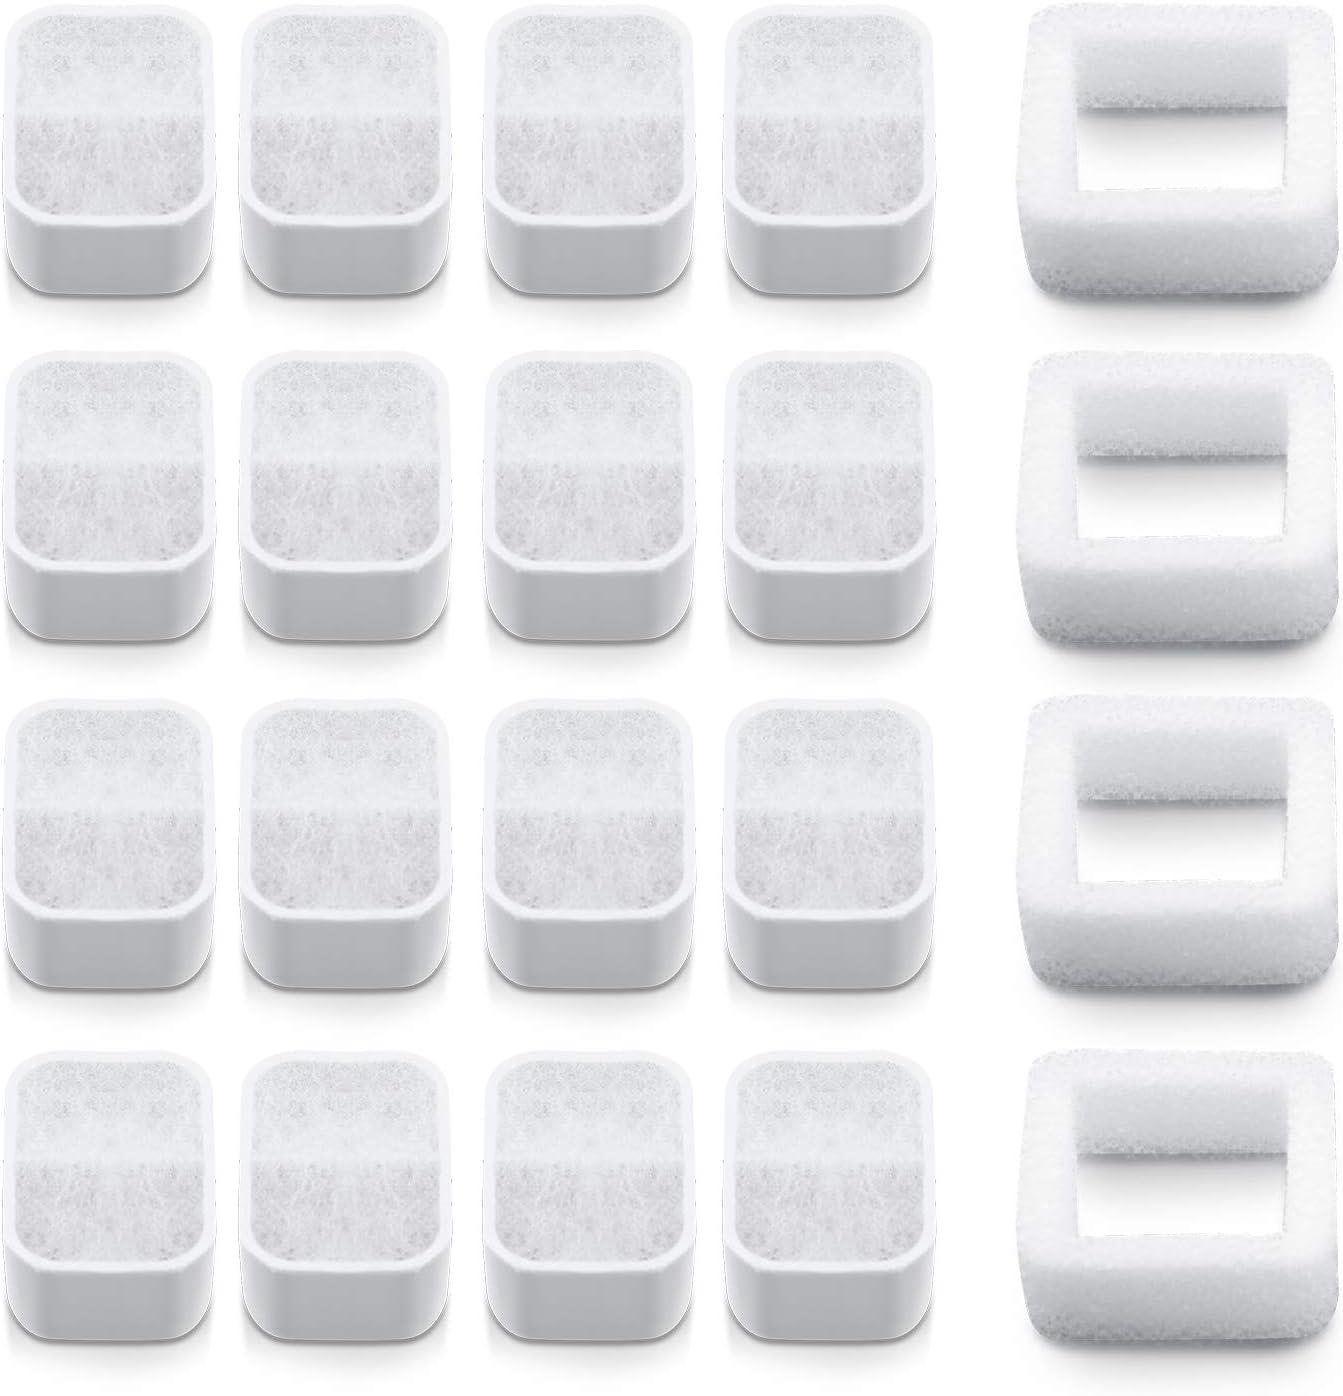 NautyPaws Filters for iPettie Tritone Ceramic Pet Drinking Fountain, Fiumi/Vekonn Ceramic Pet Fountain(16+4)